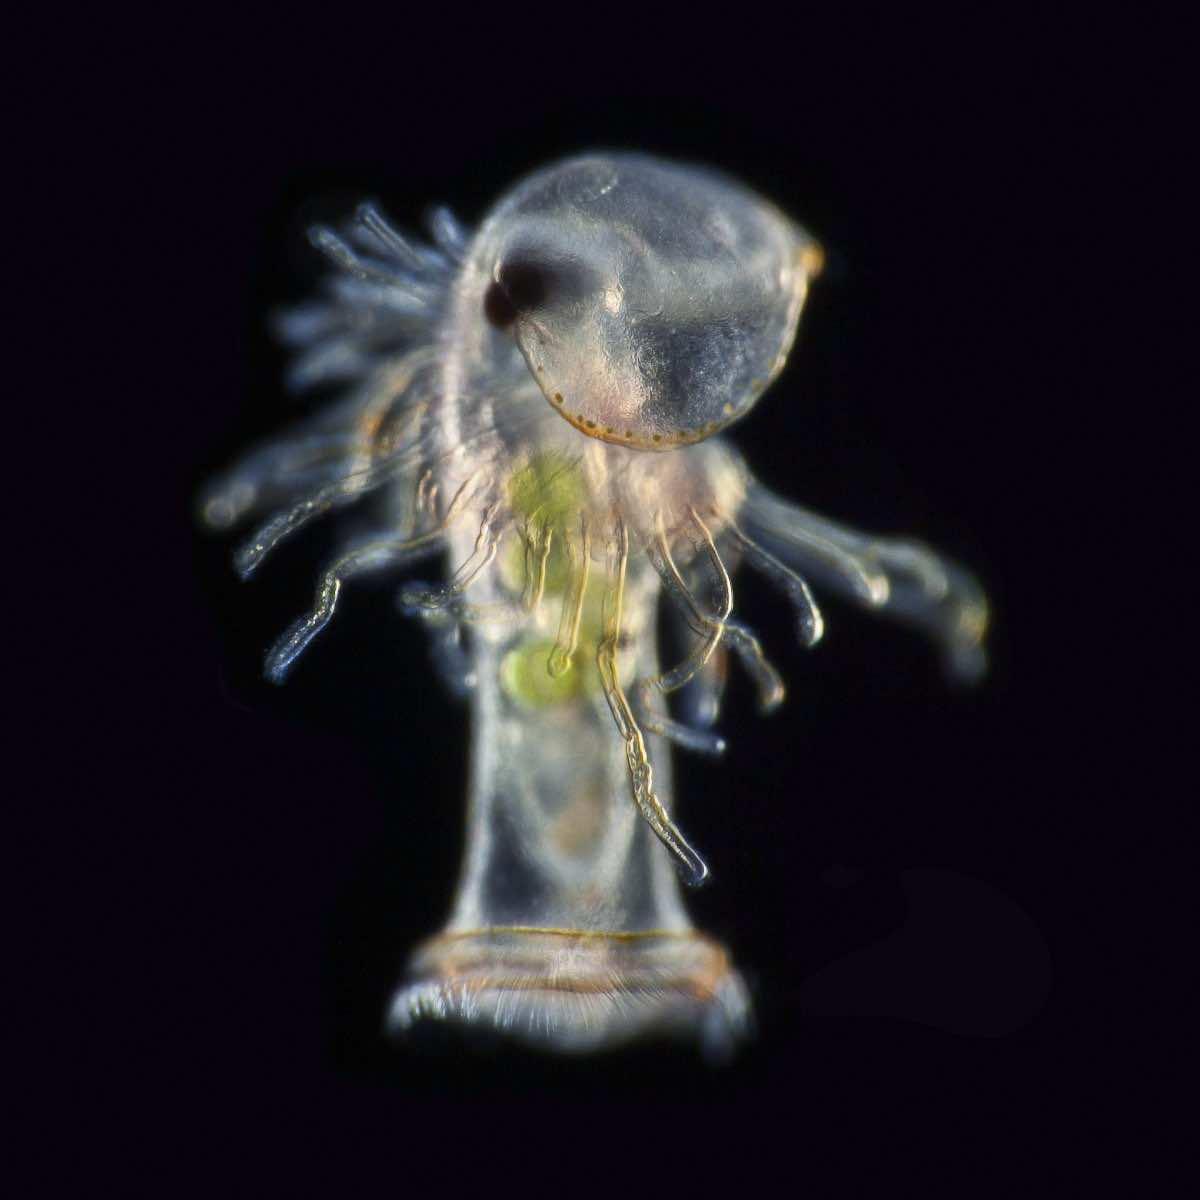 microscopic photography41